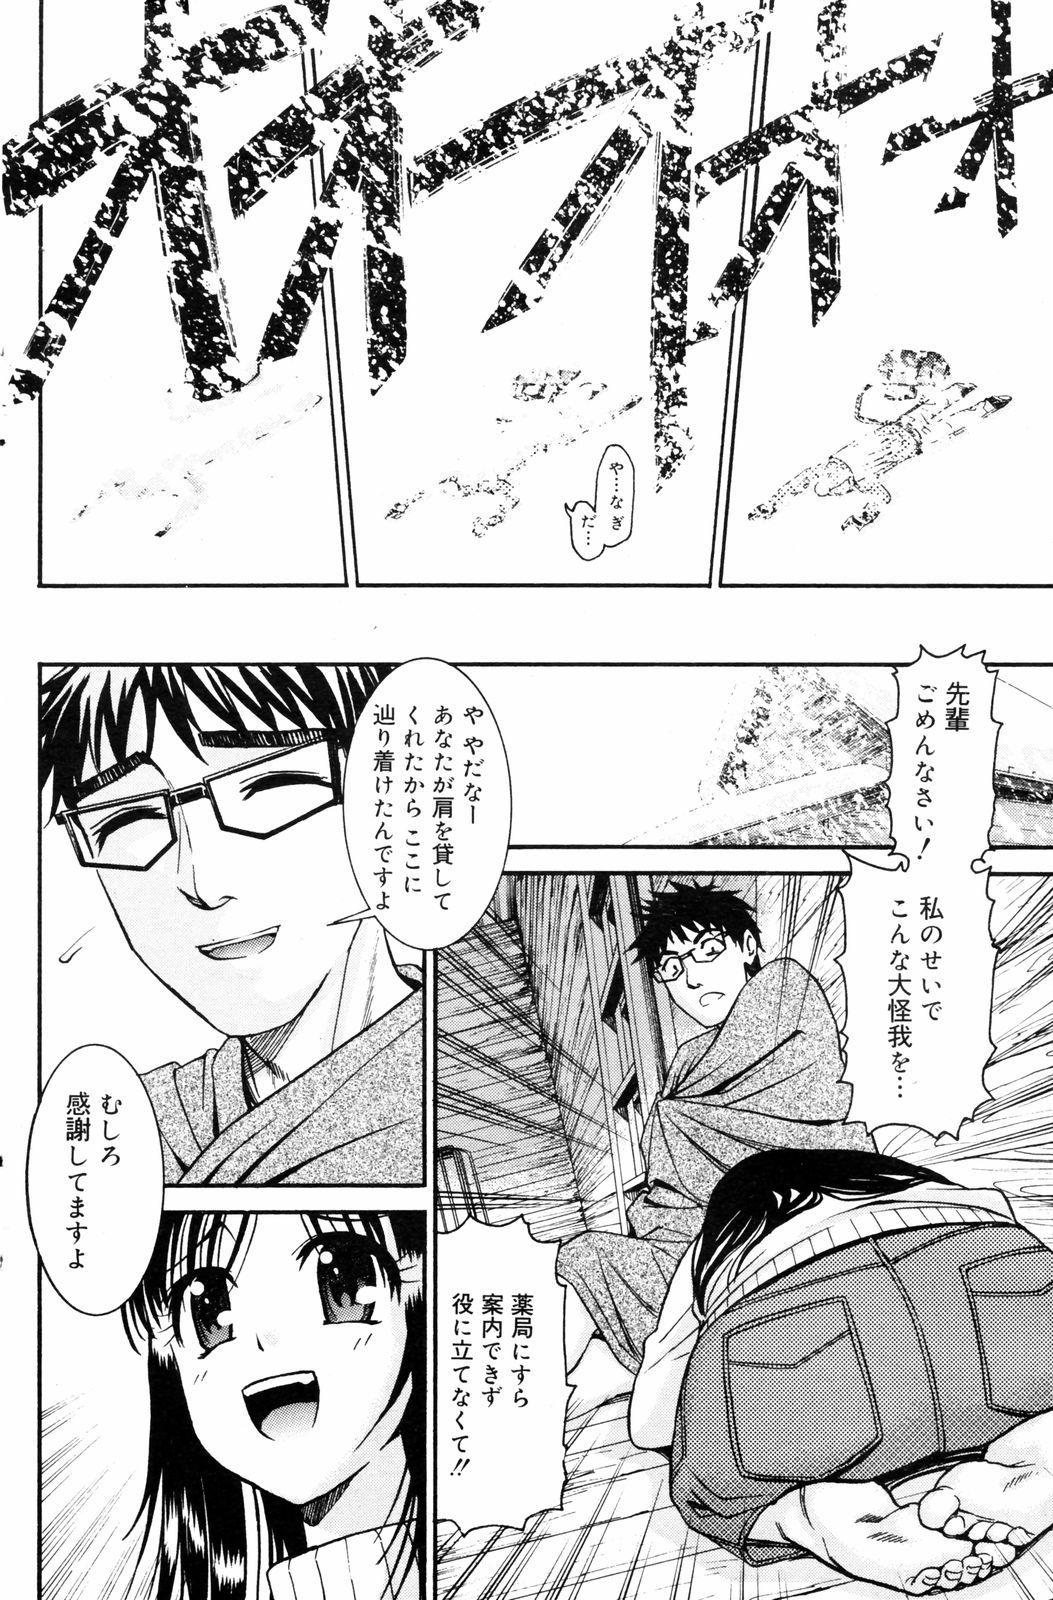 Manga Bangaichi 2008-03 137